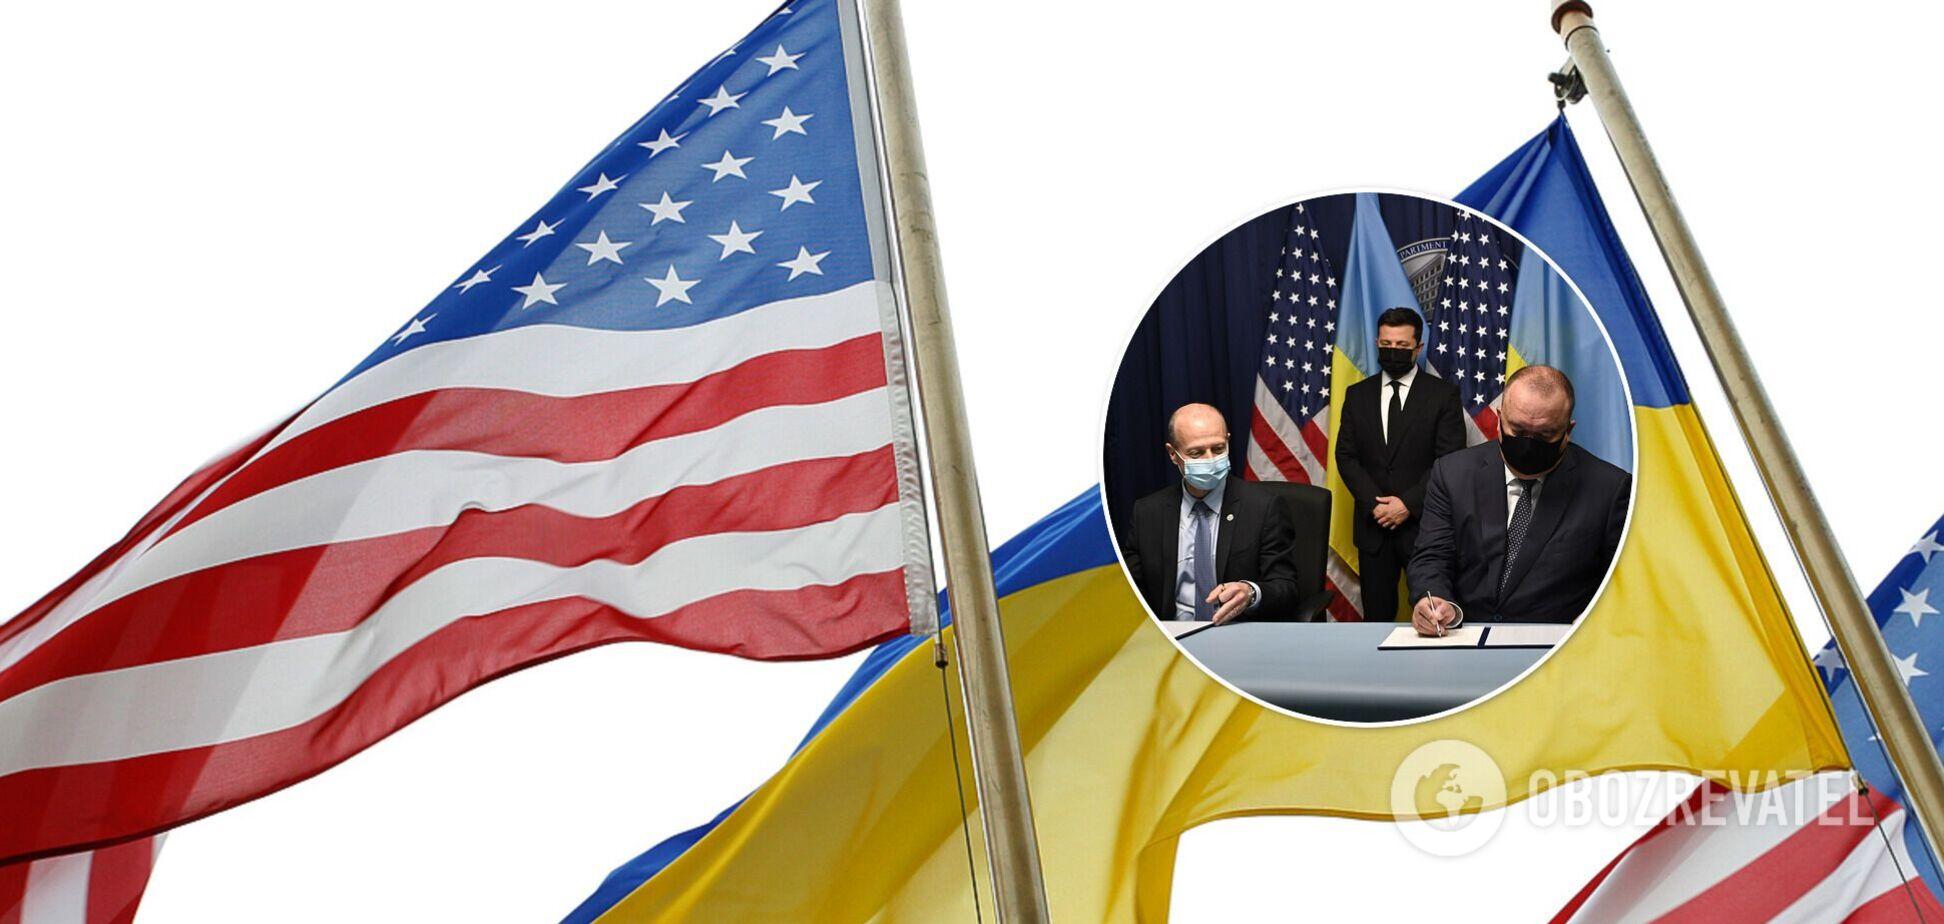 Партнерство України і США